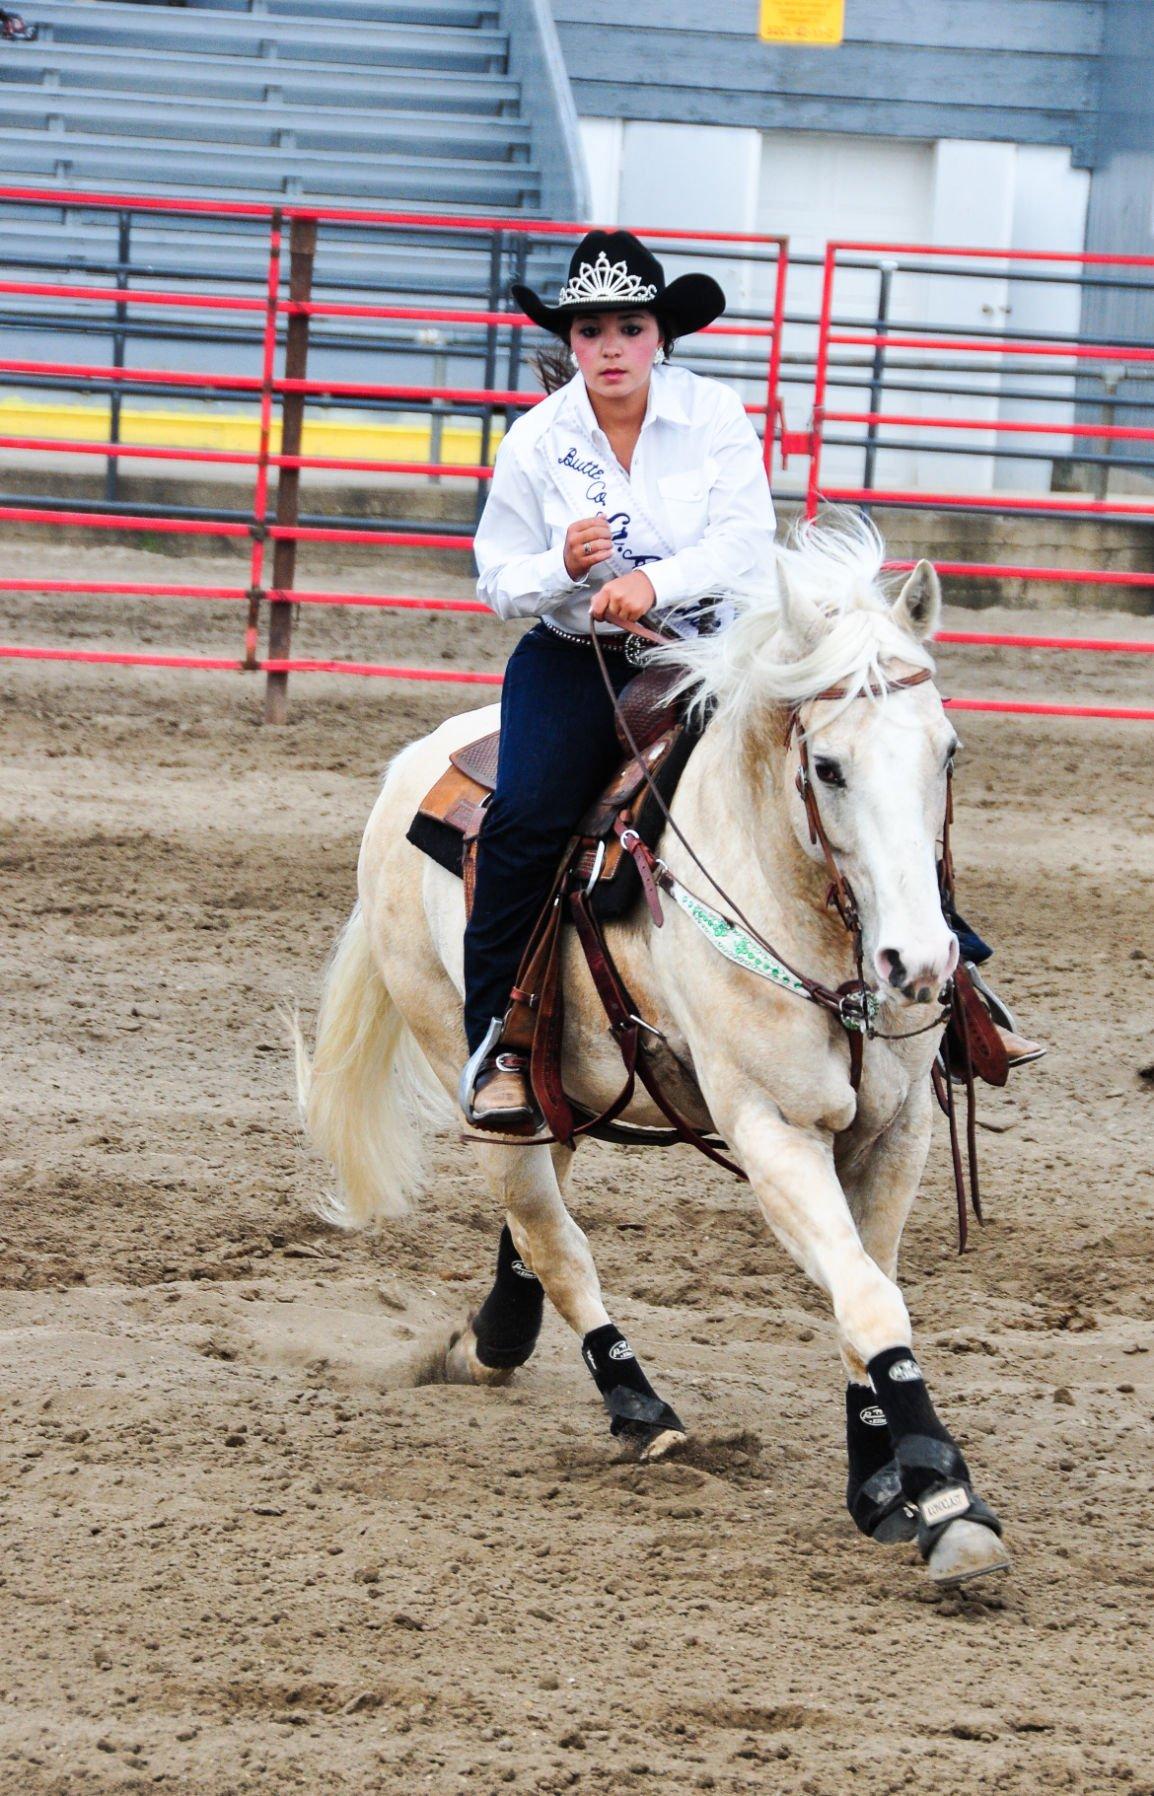 4-H Rodeo State Finals Rodeo Queen Horsemanship | Gallery ...